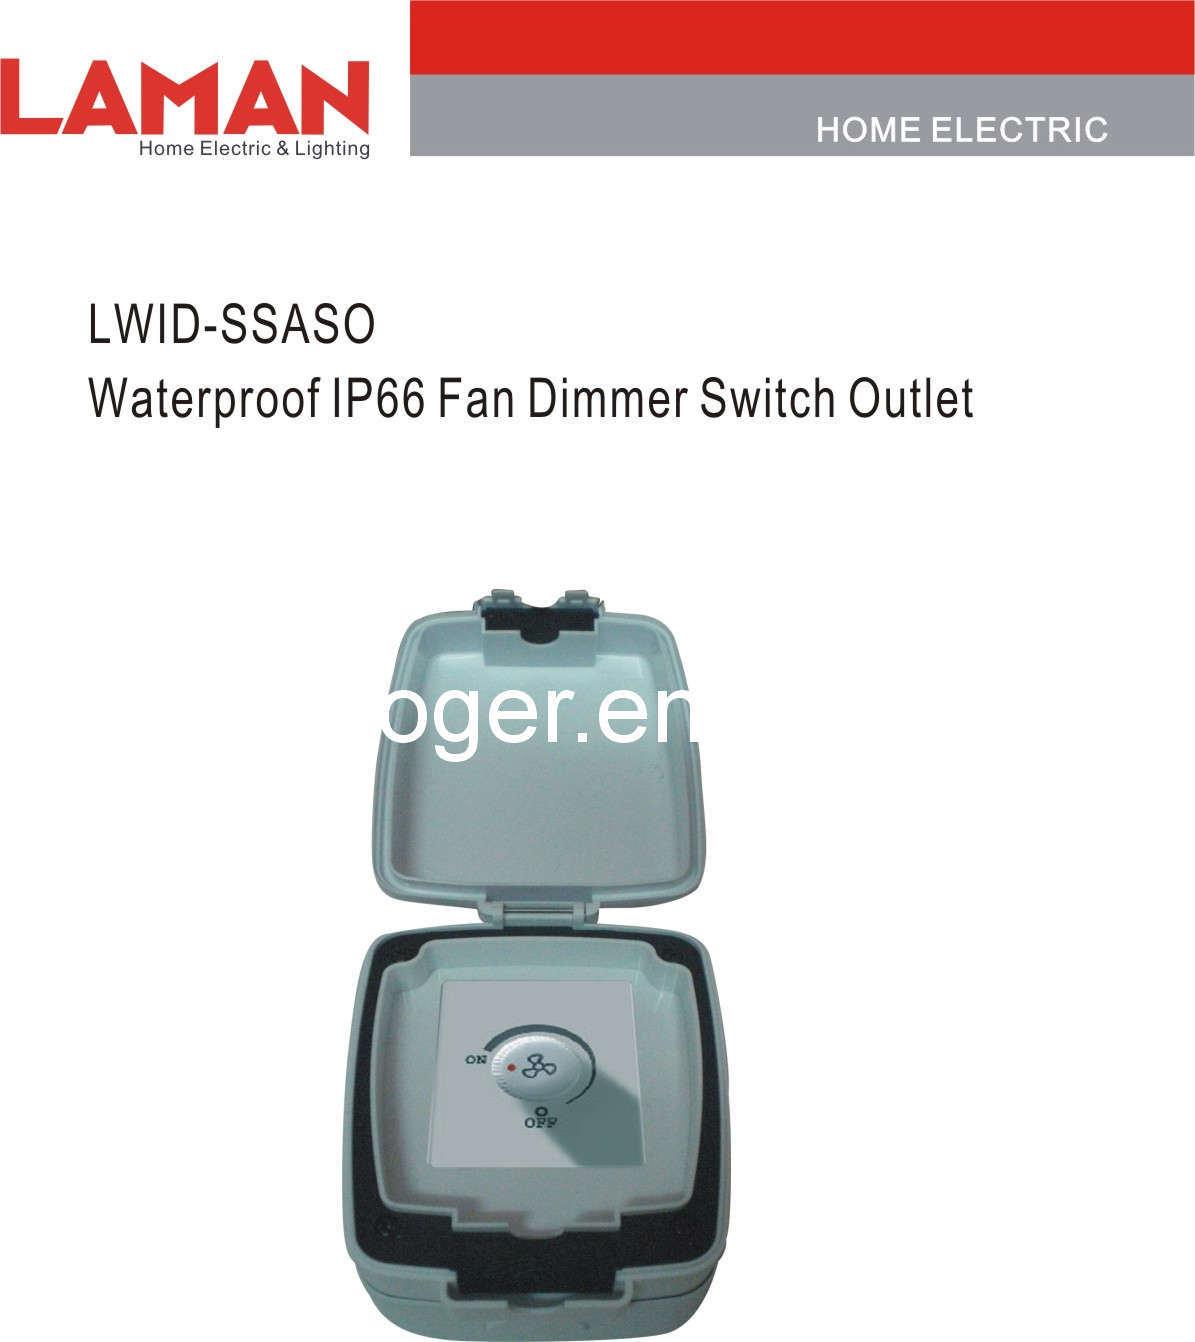 lwid ssaso waterproof ip65 fan dimmer switch outlet china waterproof switch. Black Bedroom Furniture Sets. Home Design Ideas